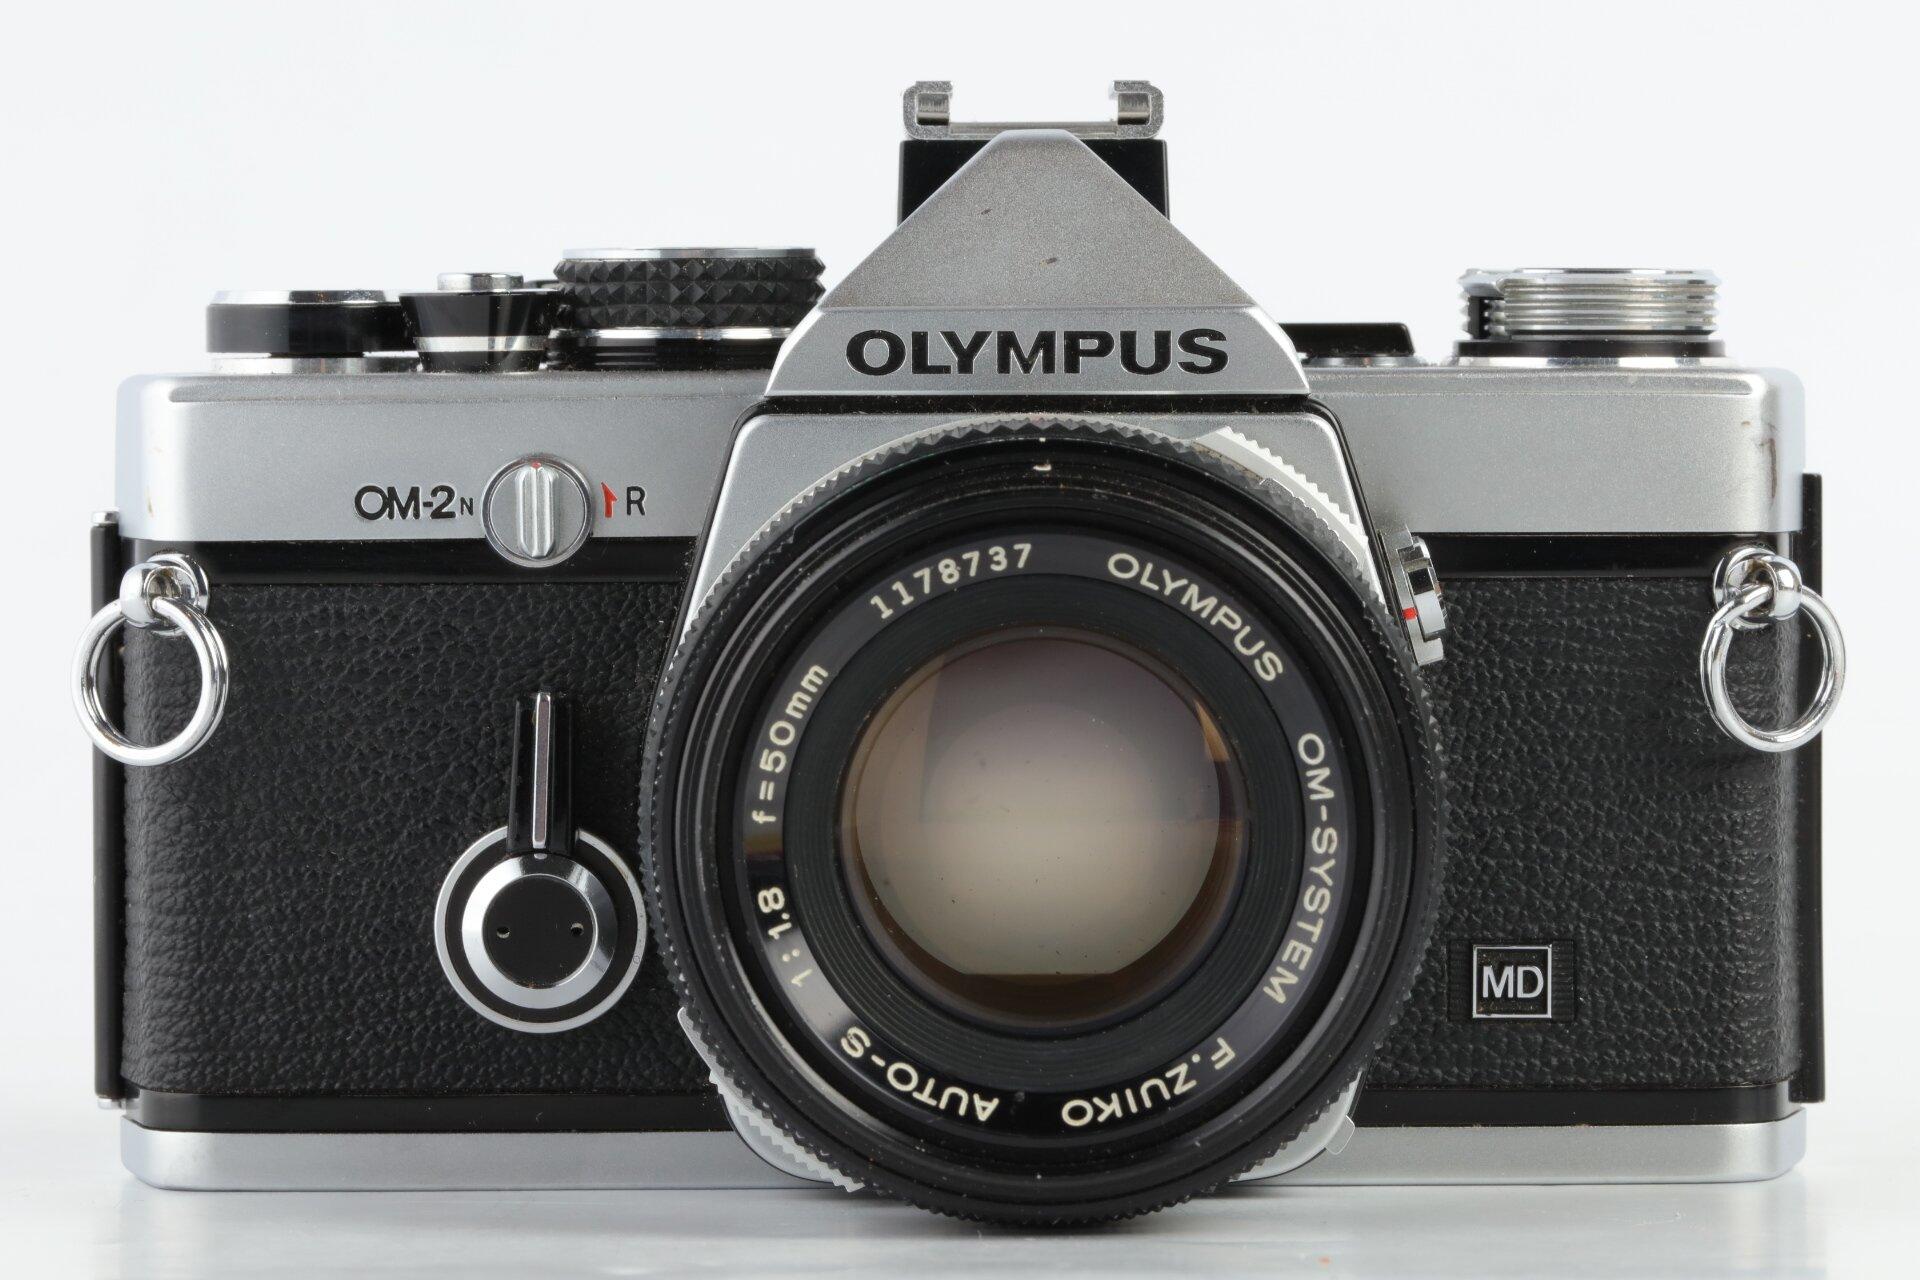 Olympus OM-2n chrom + Zuiko Auto-S 1,8/50mm